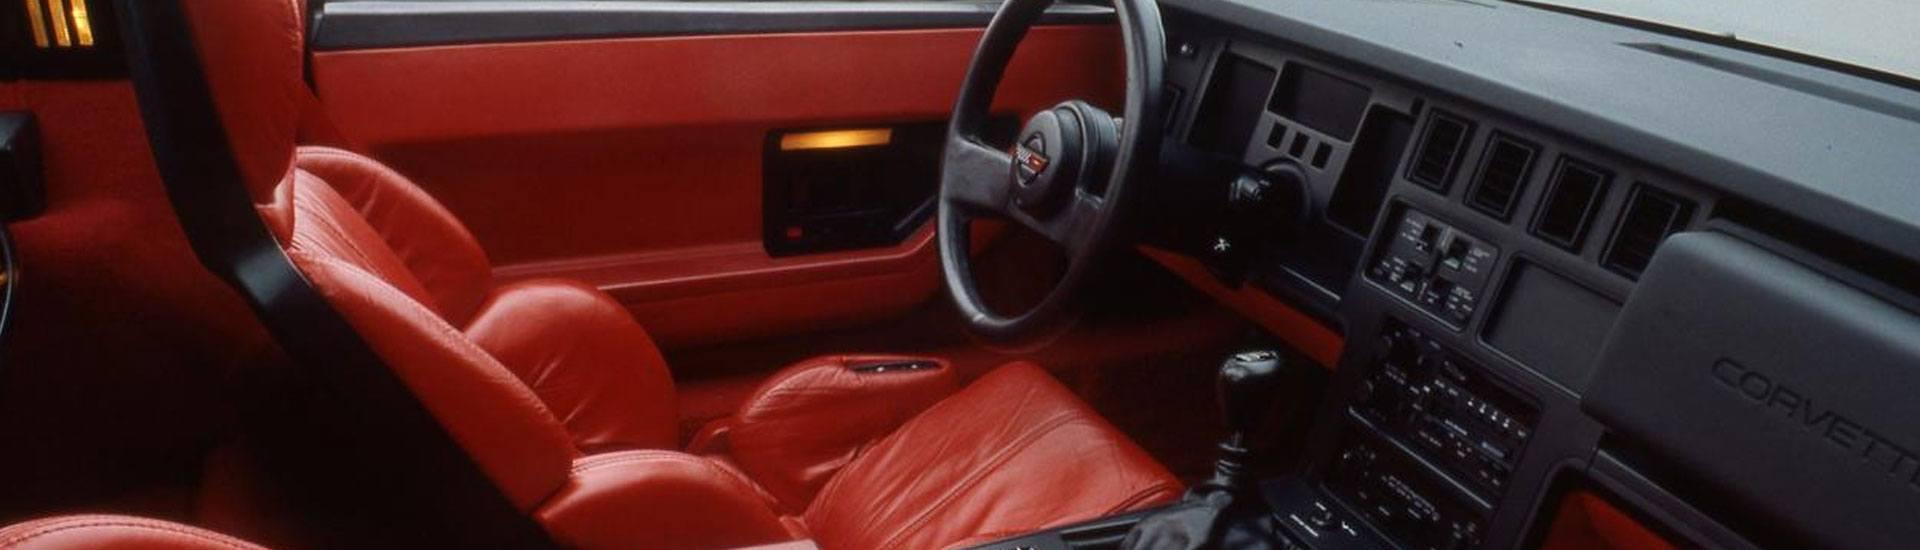 1989 Chevrolet Corvette Dash Kits Custom 1989 Chevrolet